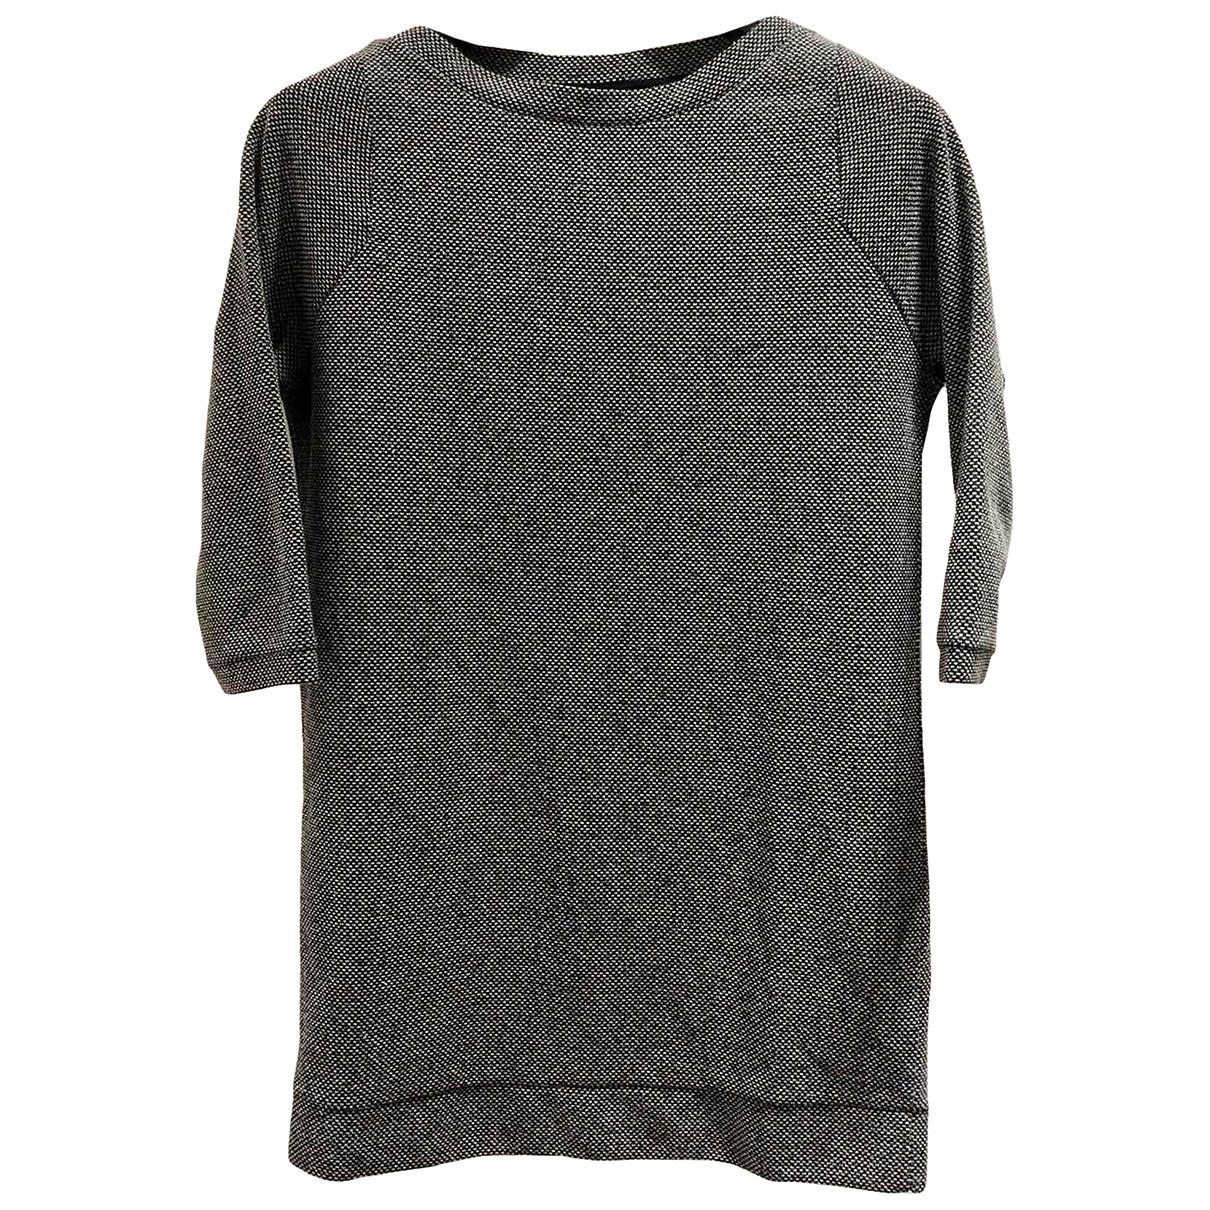 Cos \N Kleid in  Weiss Polyester